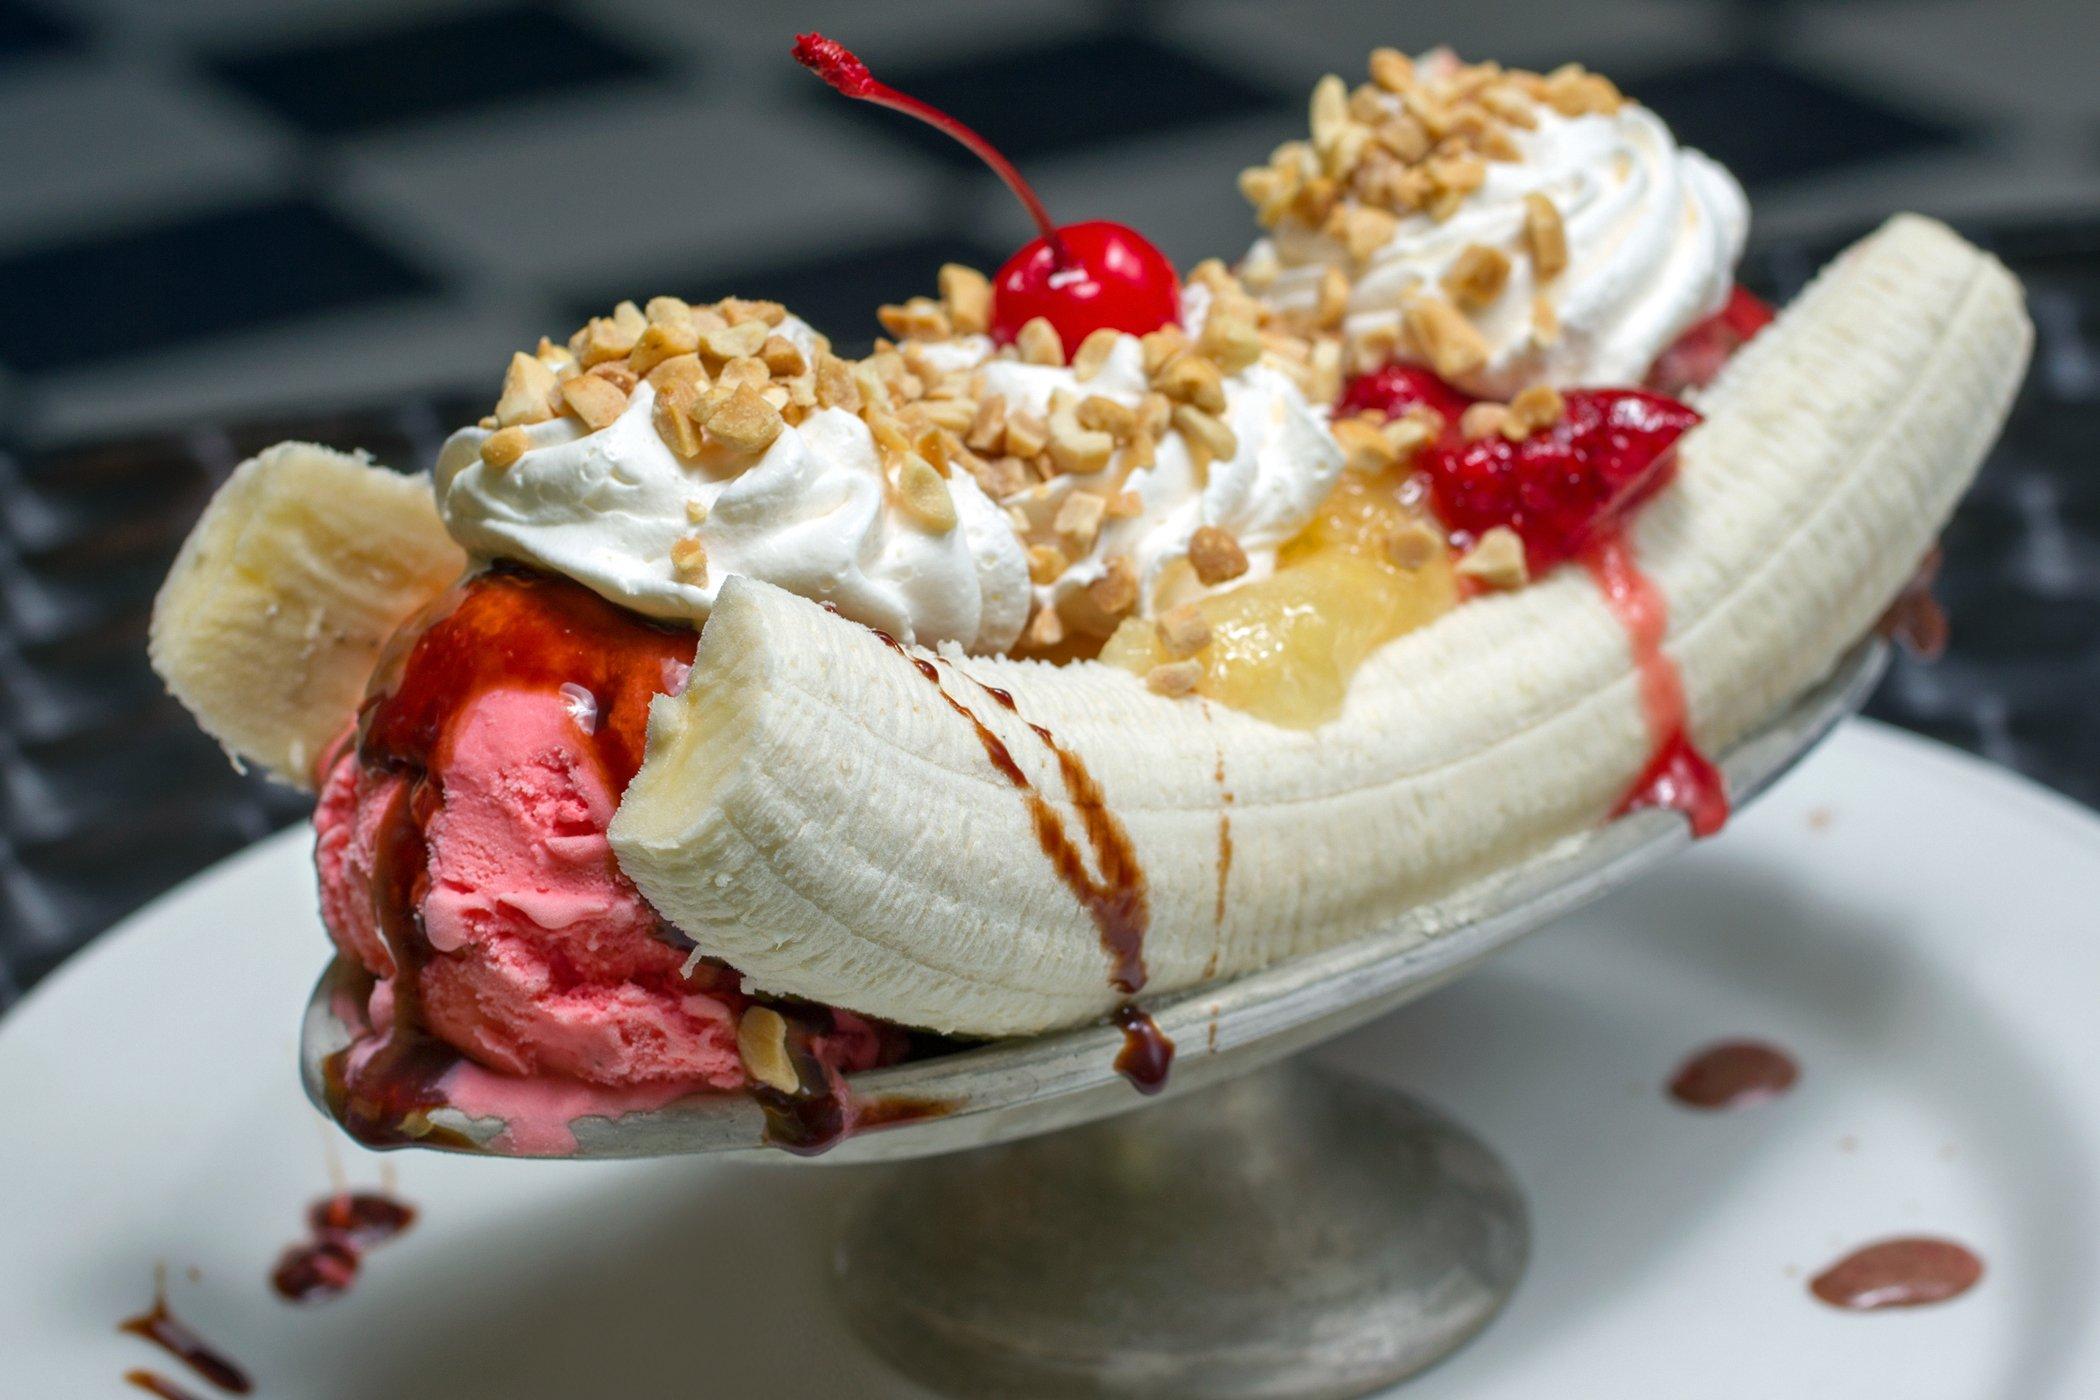 banana-split-ice-cream-dessert-sweets-sugar-1bananasplit-wallpaper-3